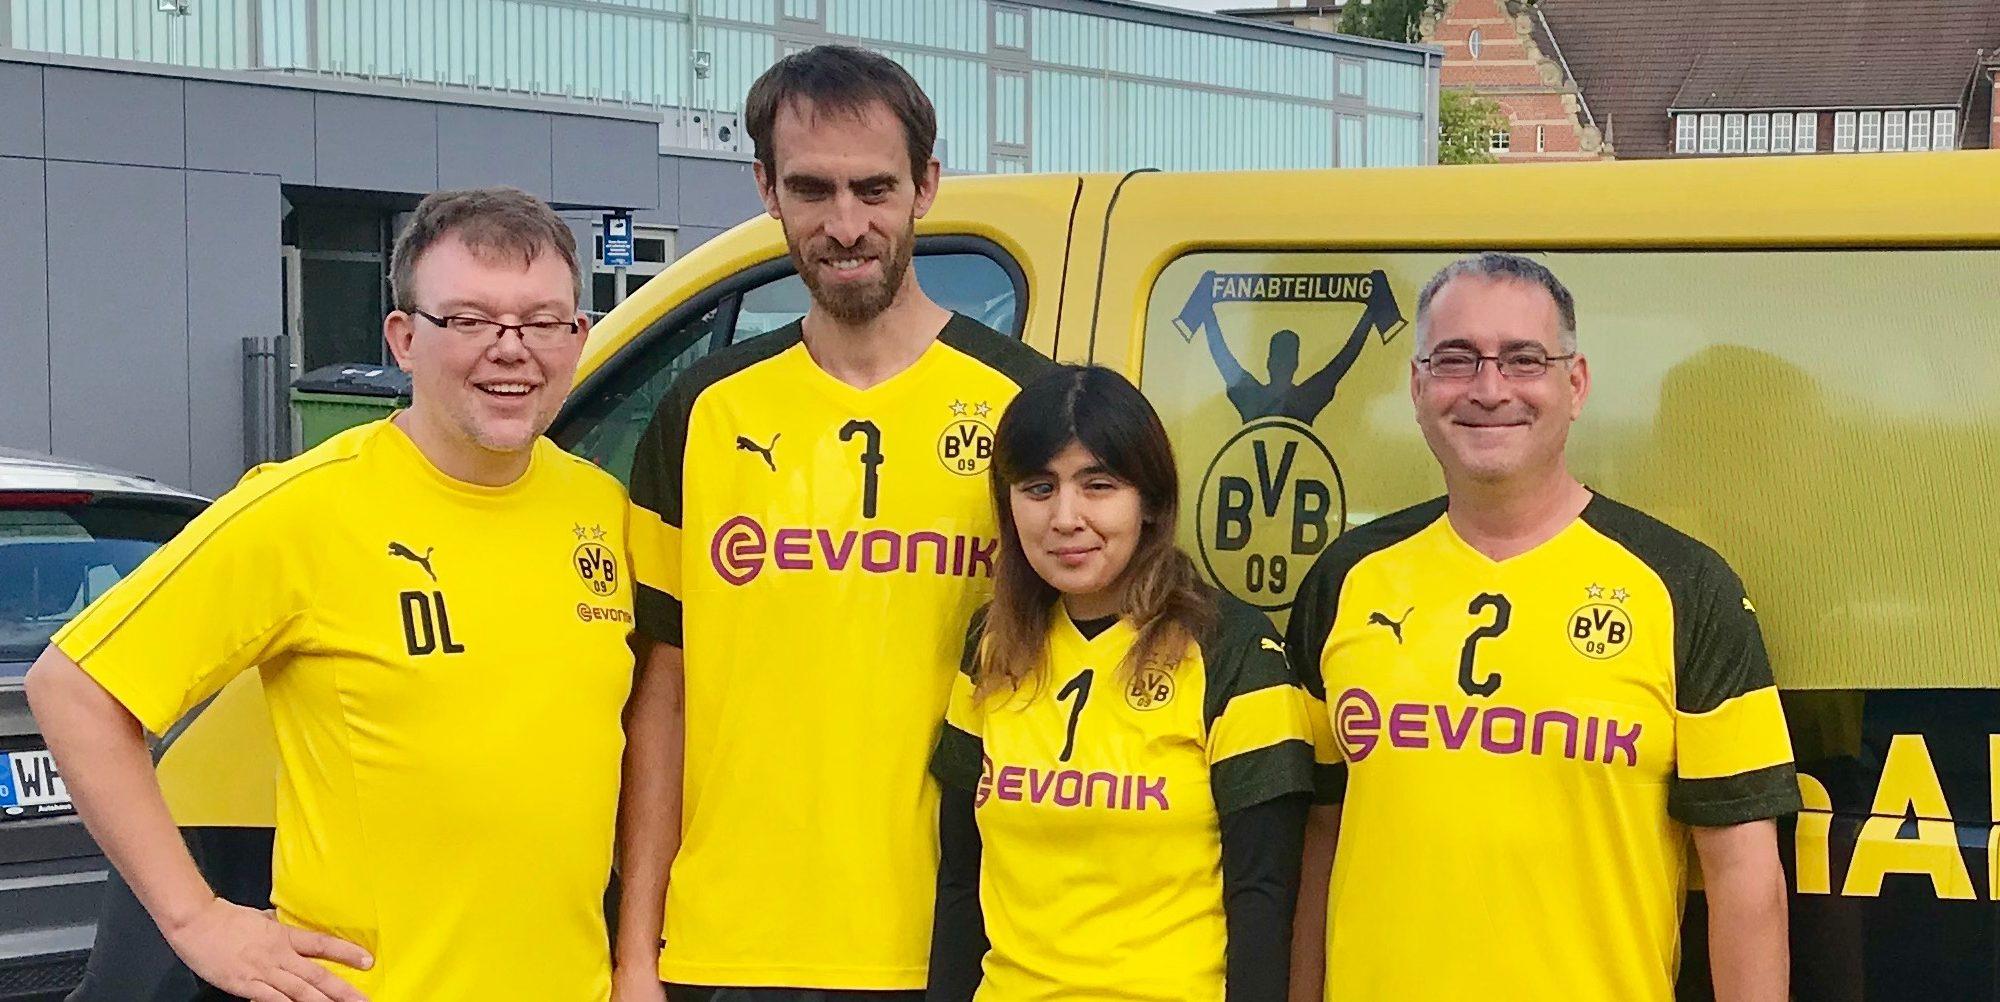 Mannschaftsfoto BVB komplett vor dem Auto